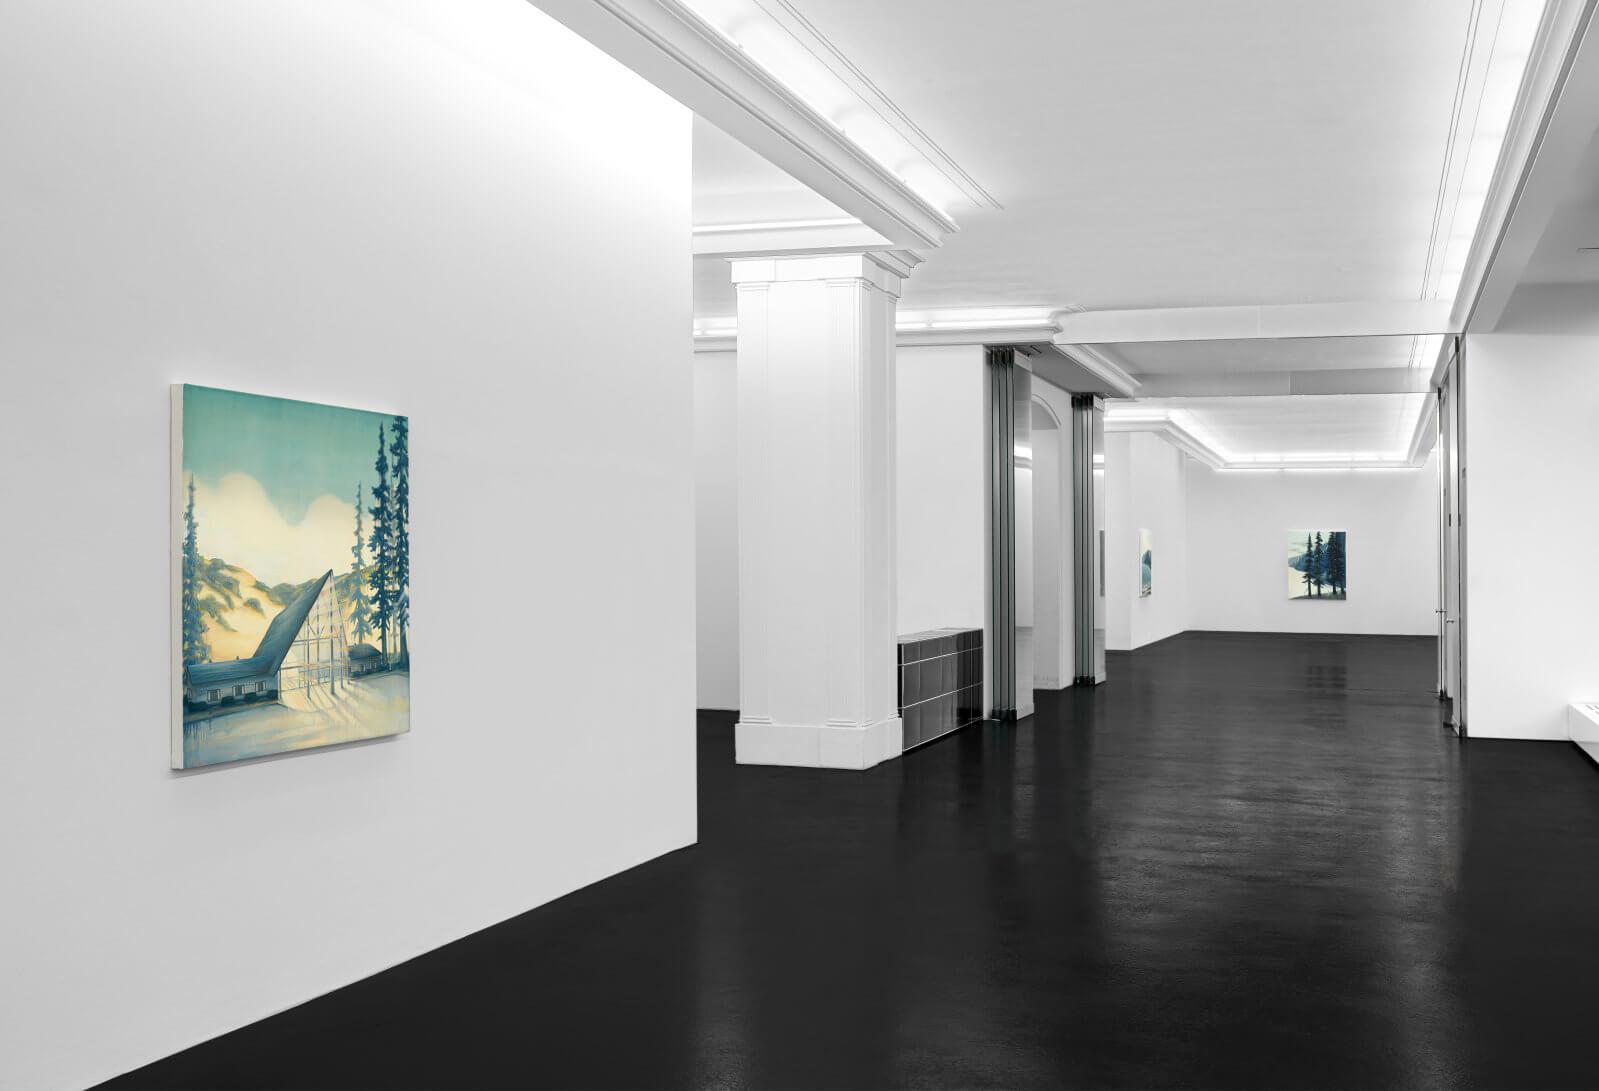 DA-Natural-Selections-Installation-View-6-HIRES-1600x1091.jpg